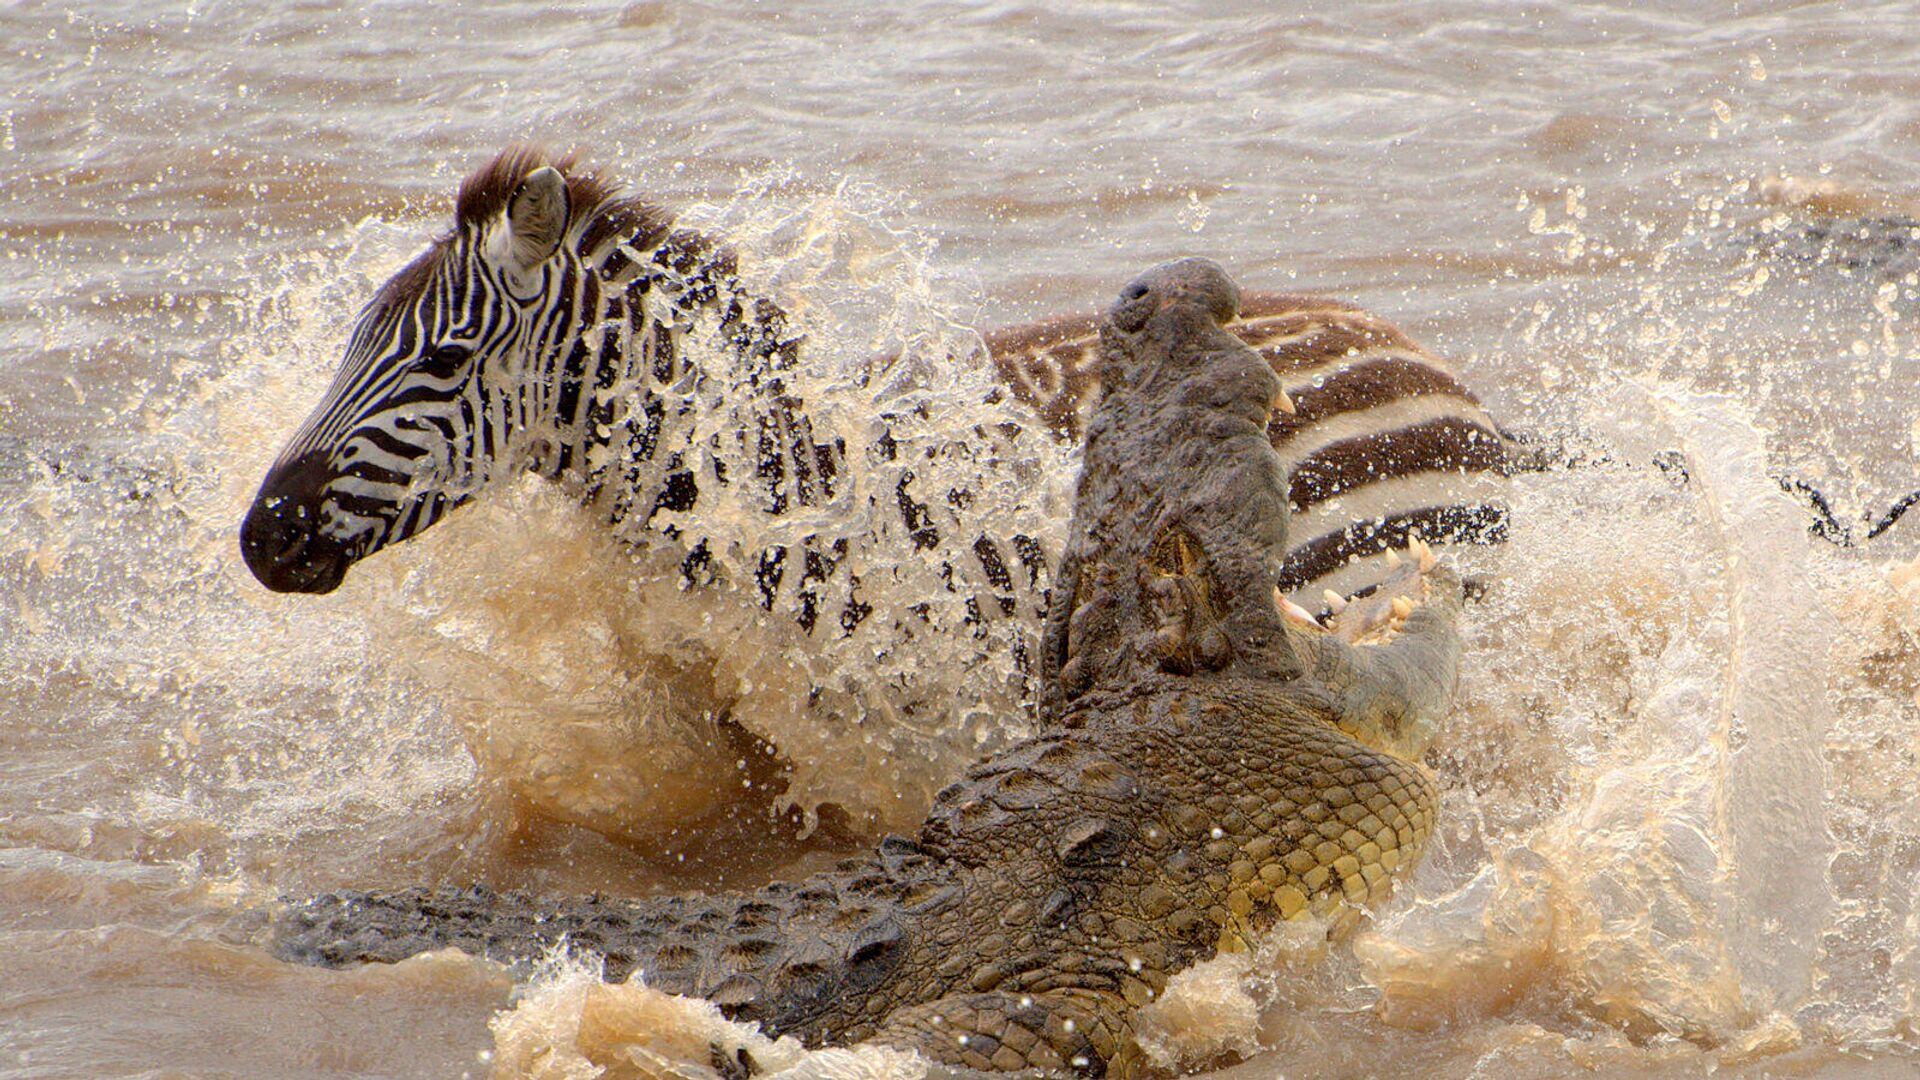 Cocodrilo atacando a una cebra en Masái Mara (Kenia) - Sputnik Mundo, 1920, 09.04.2021